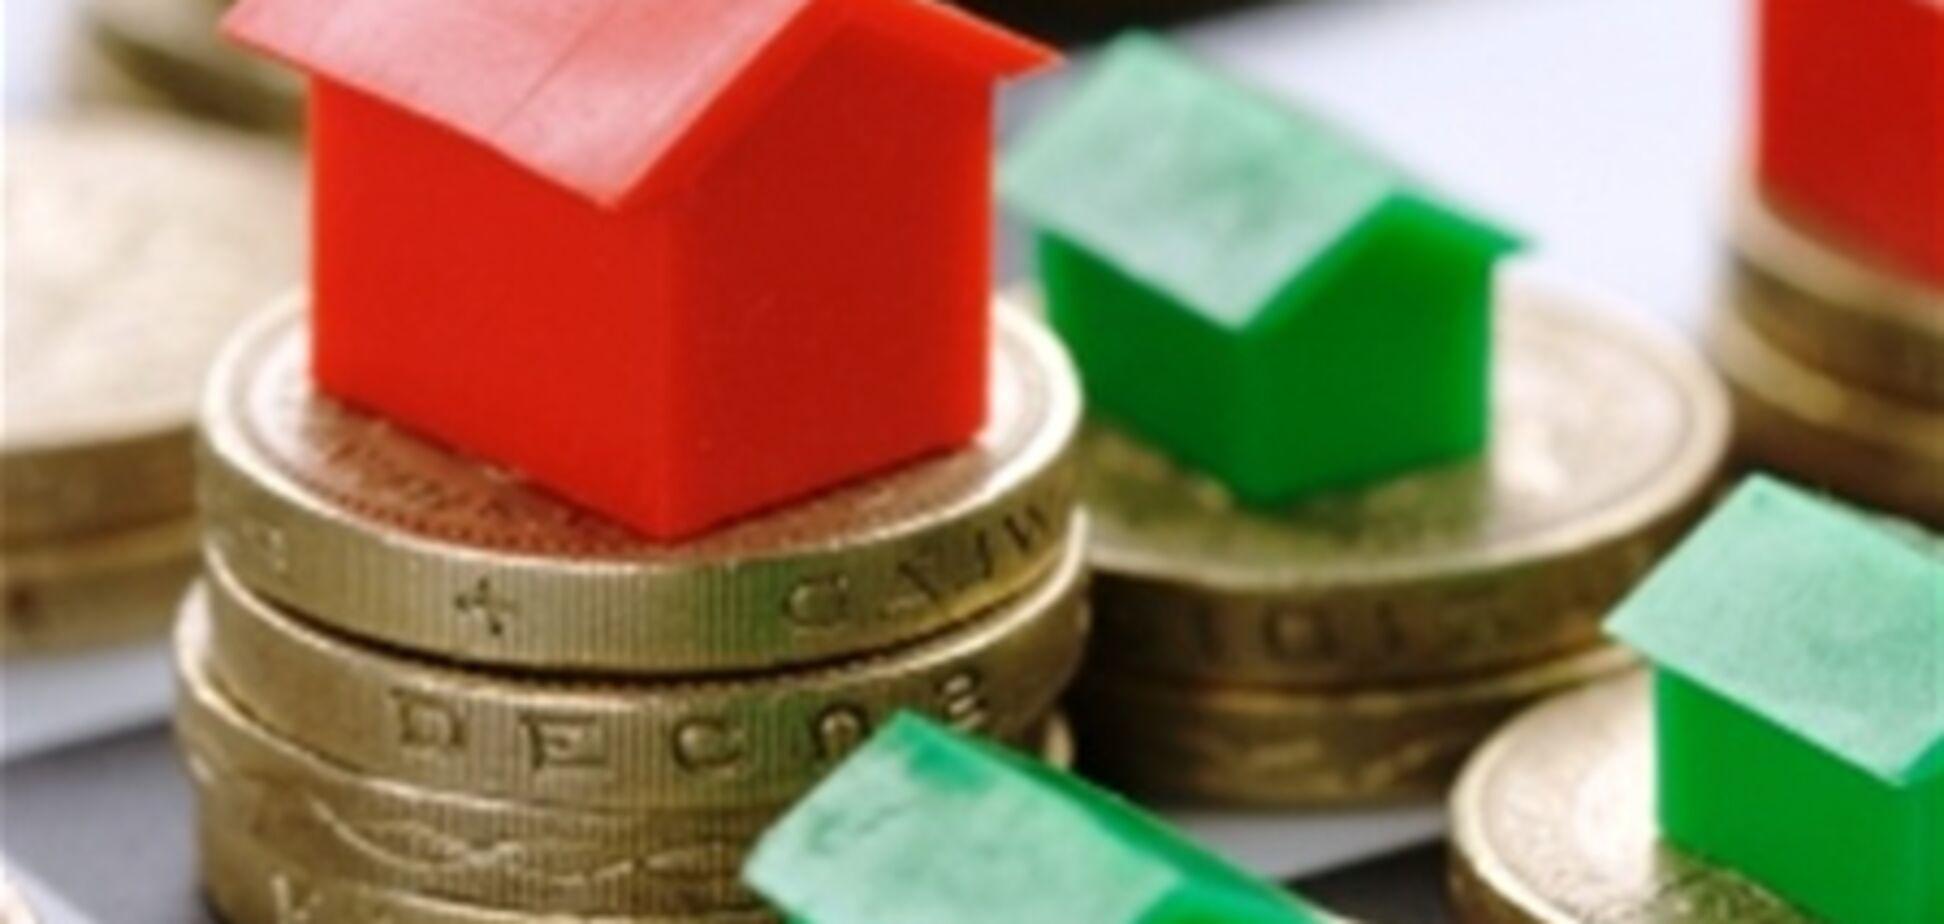 Кредит на жилье дадут если зарплата не меньше 5 тыс. грн